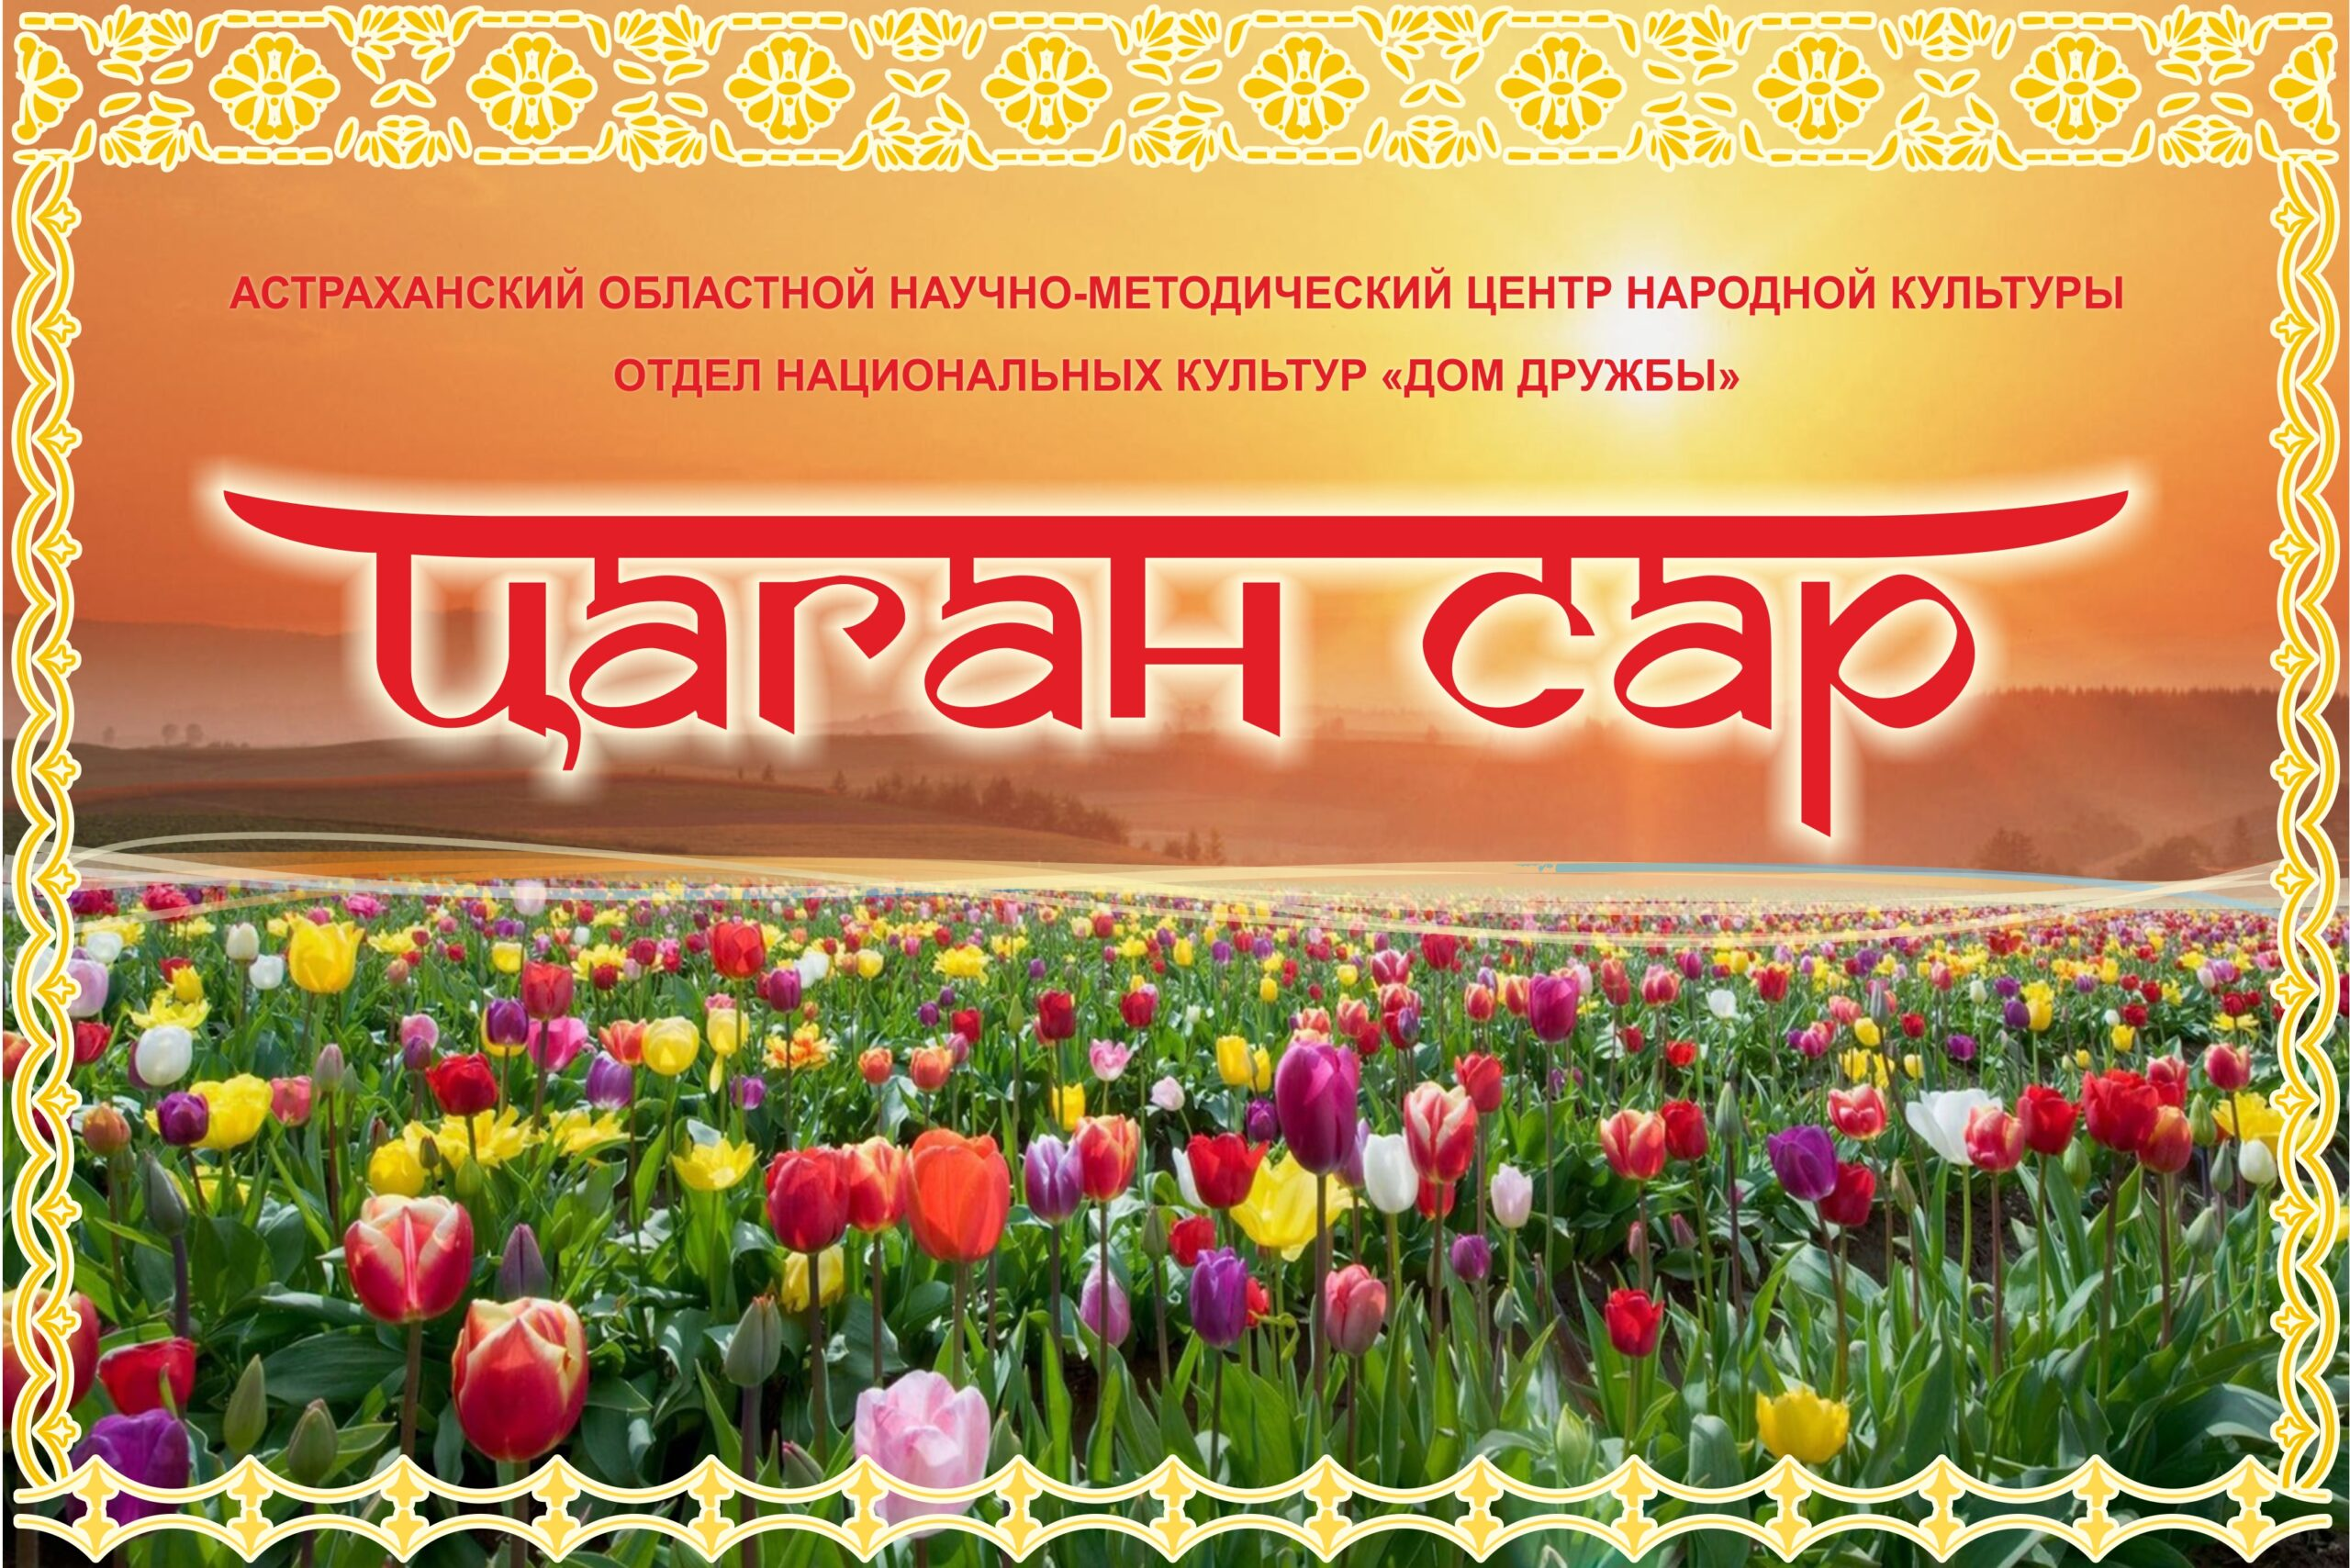 Центр народной культуры отметит Цаган Сар онлайн-программой